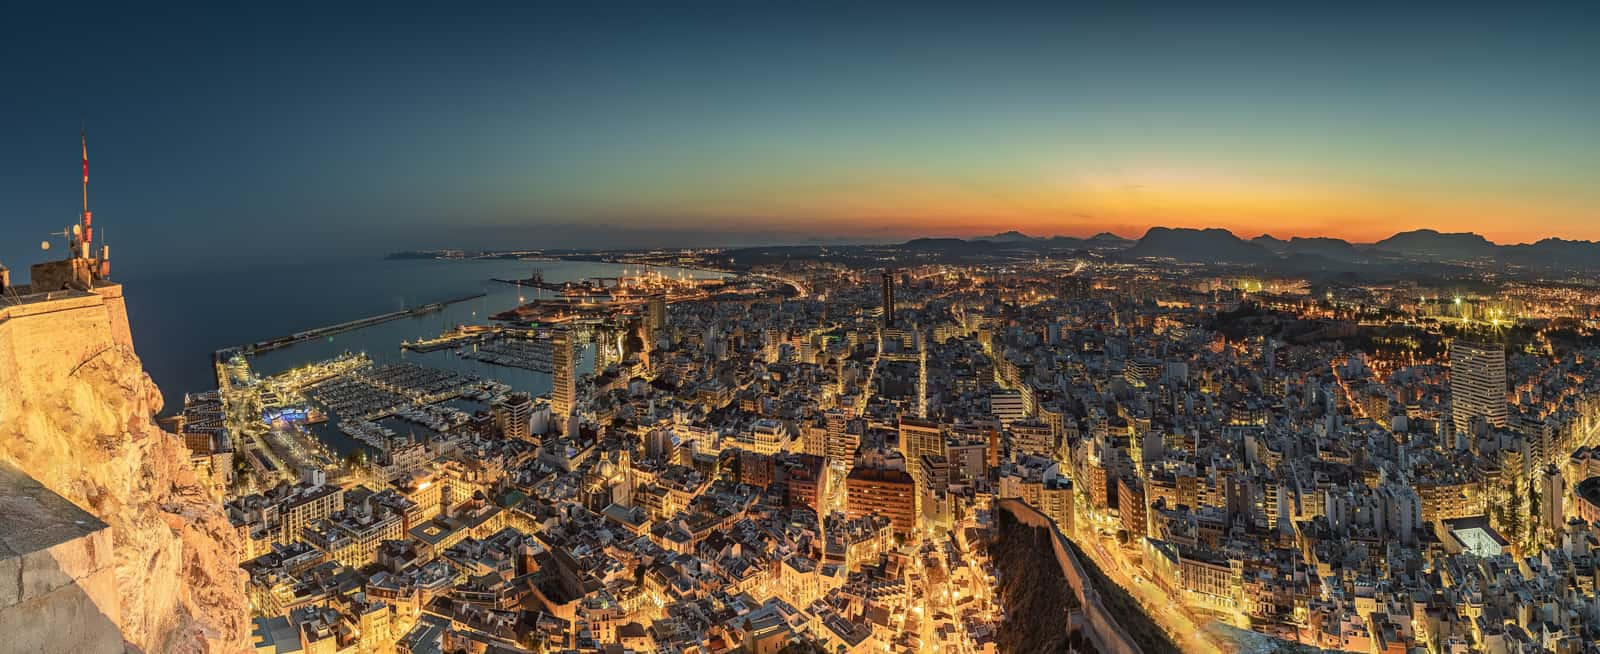 1555948514_Alicante la nuit-1